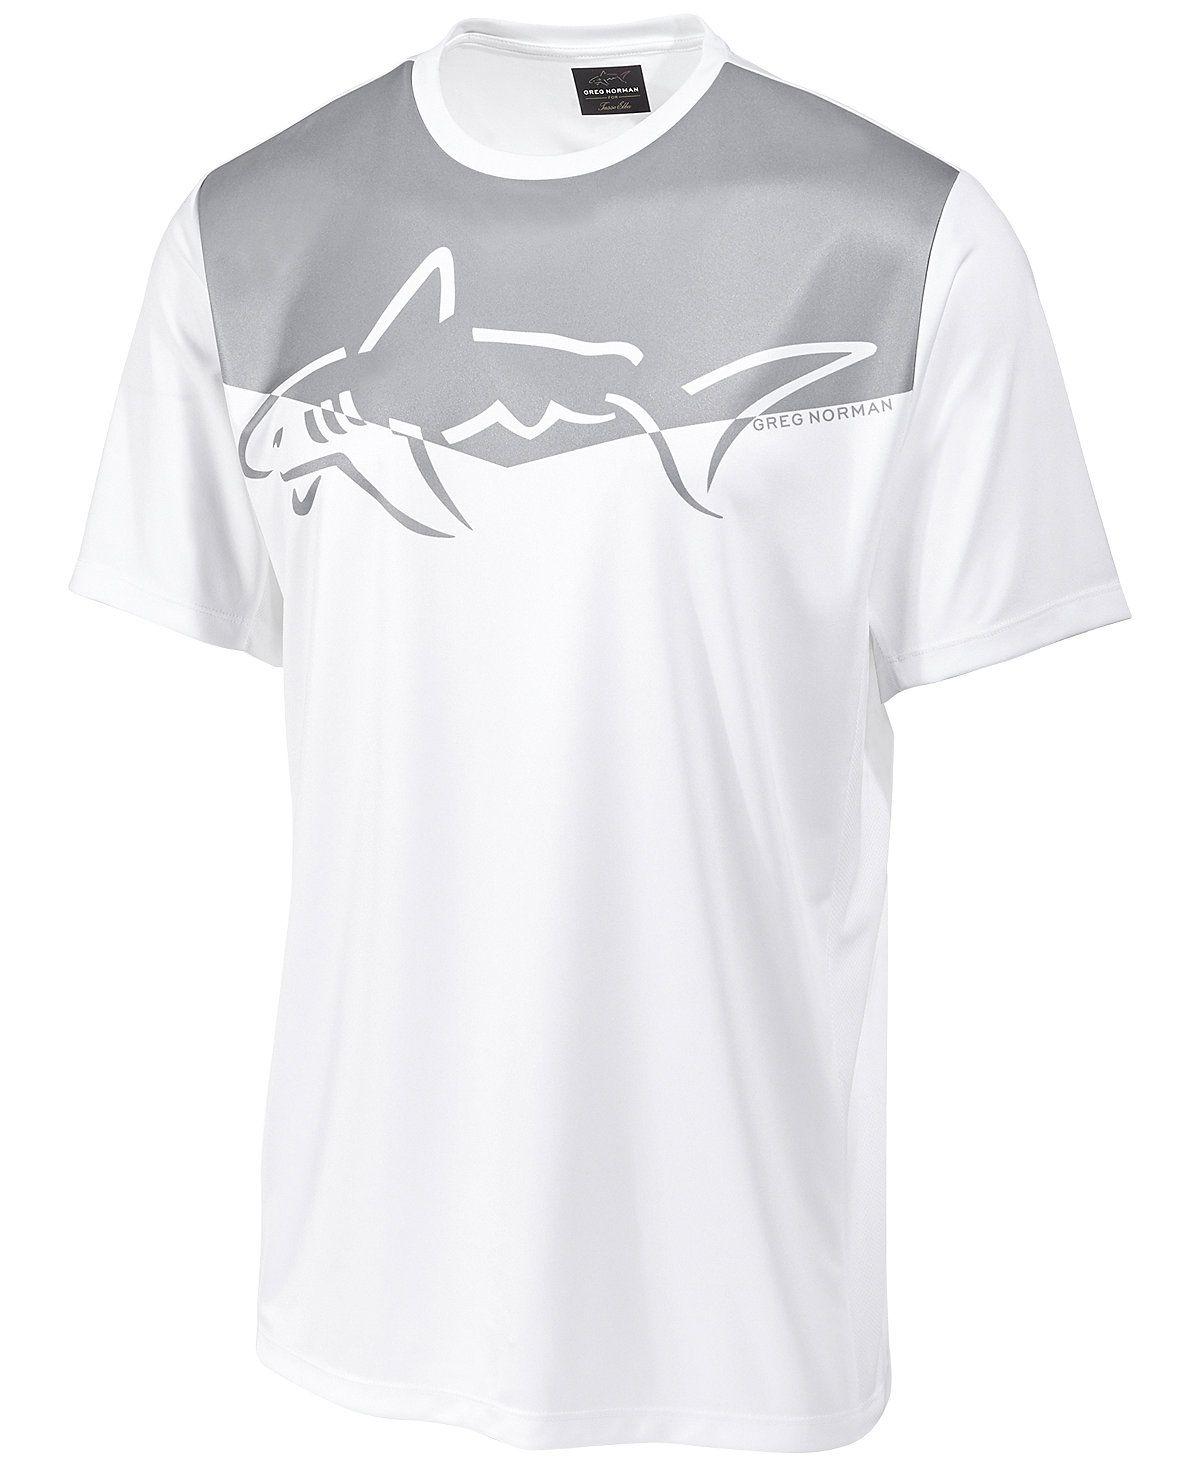 Greg Norman For Tasso Elba Men S Graphic Print Performance Sun Protection T Shirt Greg Norman Men Macy S Shirts Mens Tshirts Greg Norman